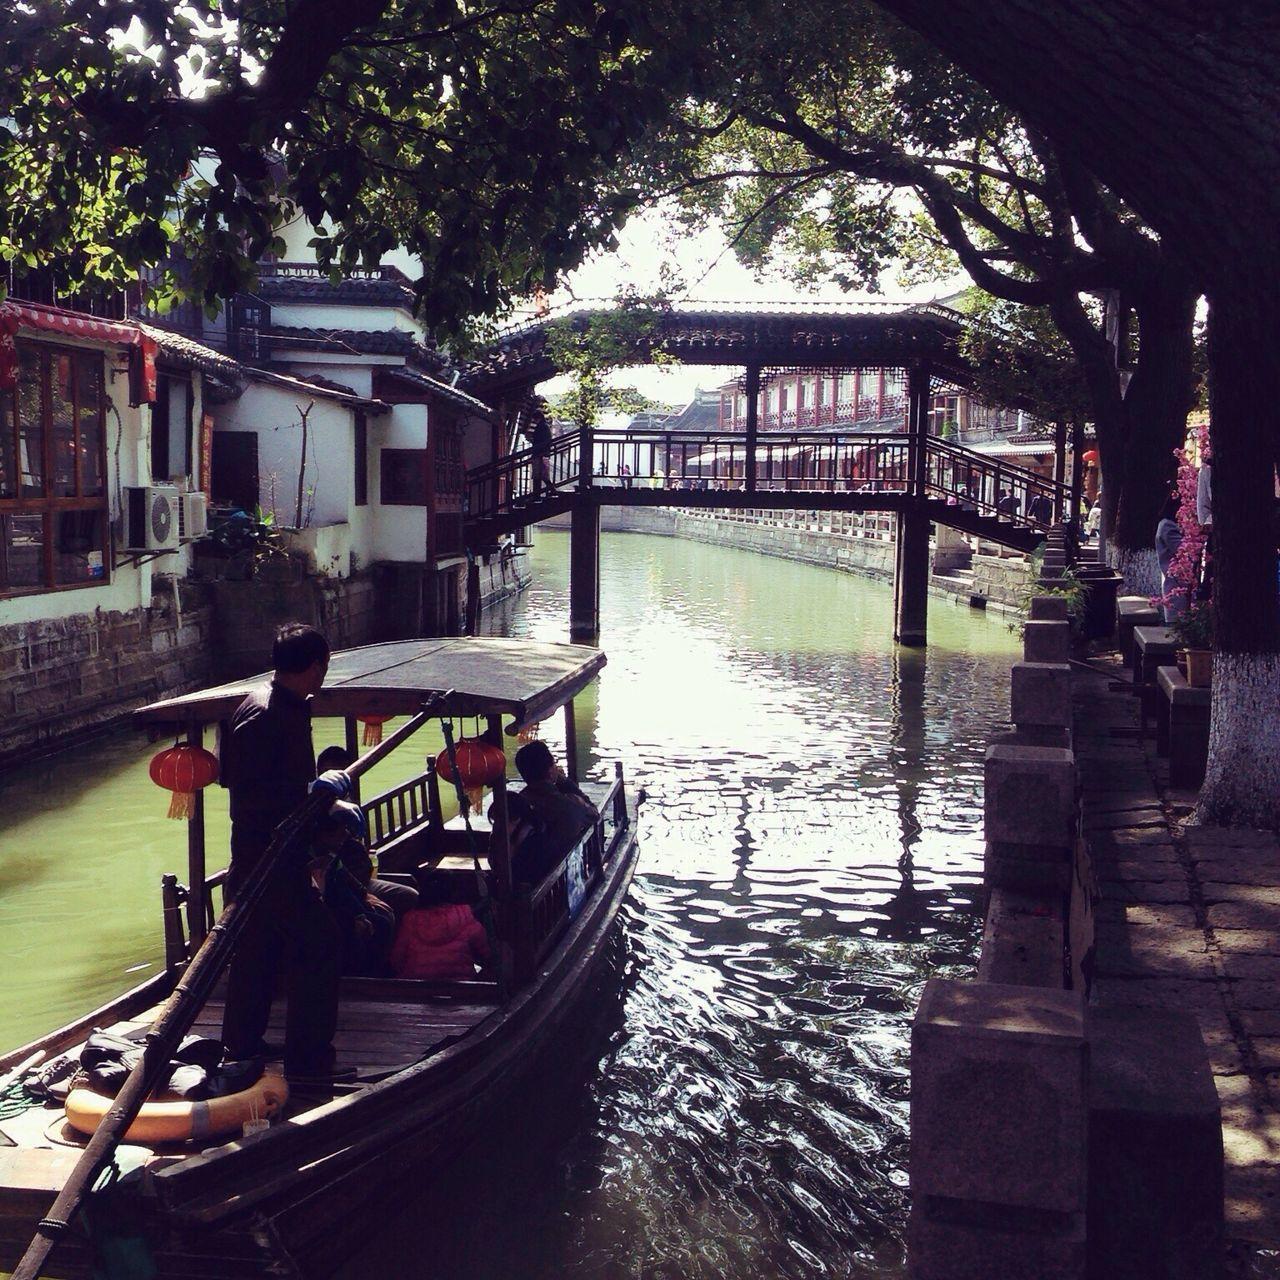 Architecture Bridge - Man Made Structure Tree Water Gondola - Traditional Boat Zhujiajiao Shanghai China